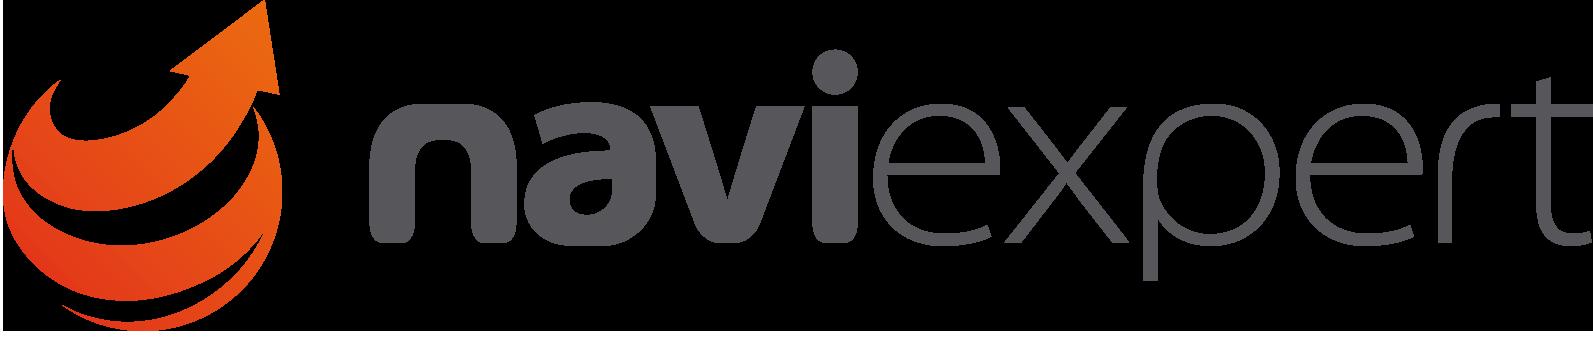 NaviExpert logo